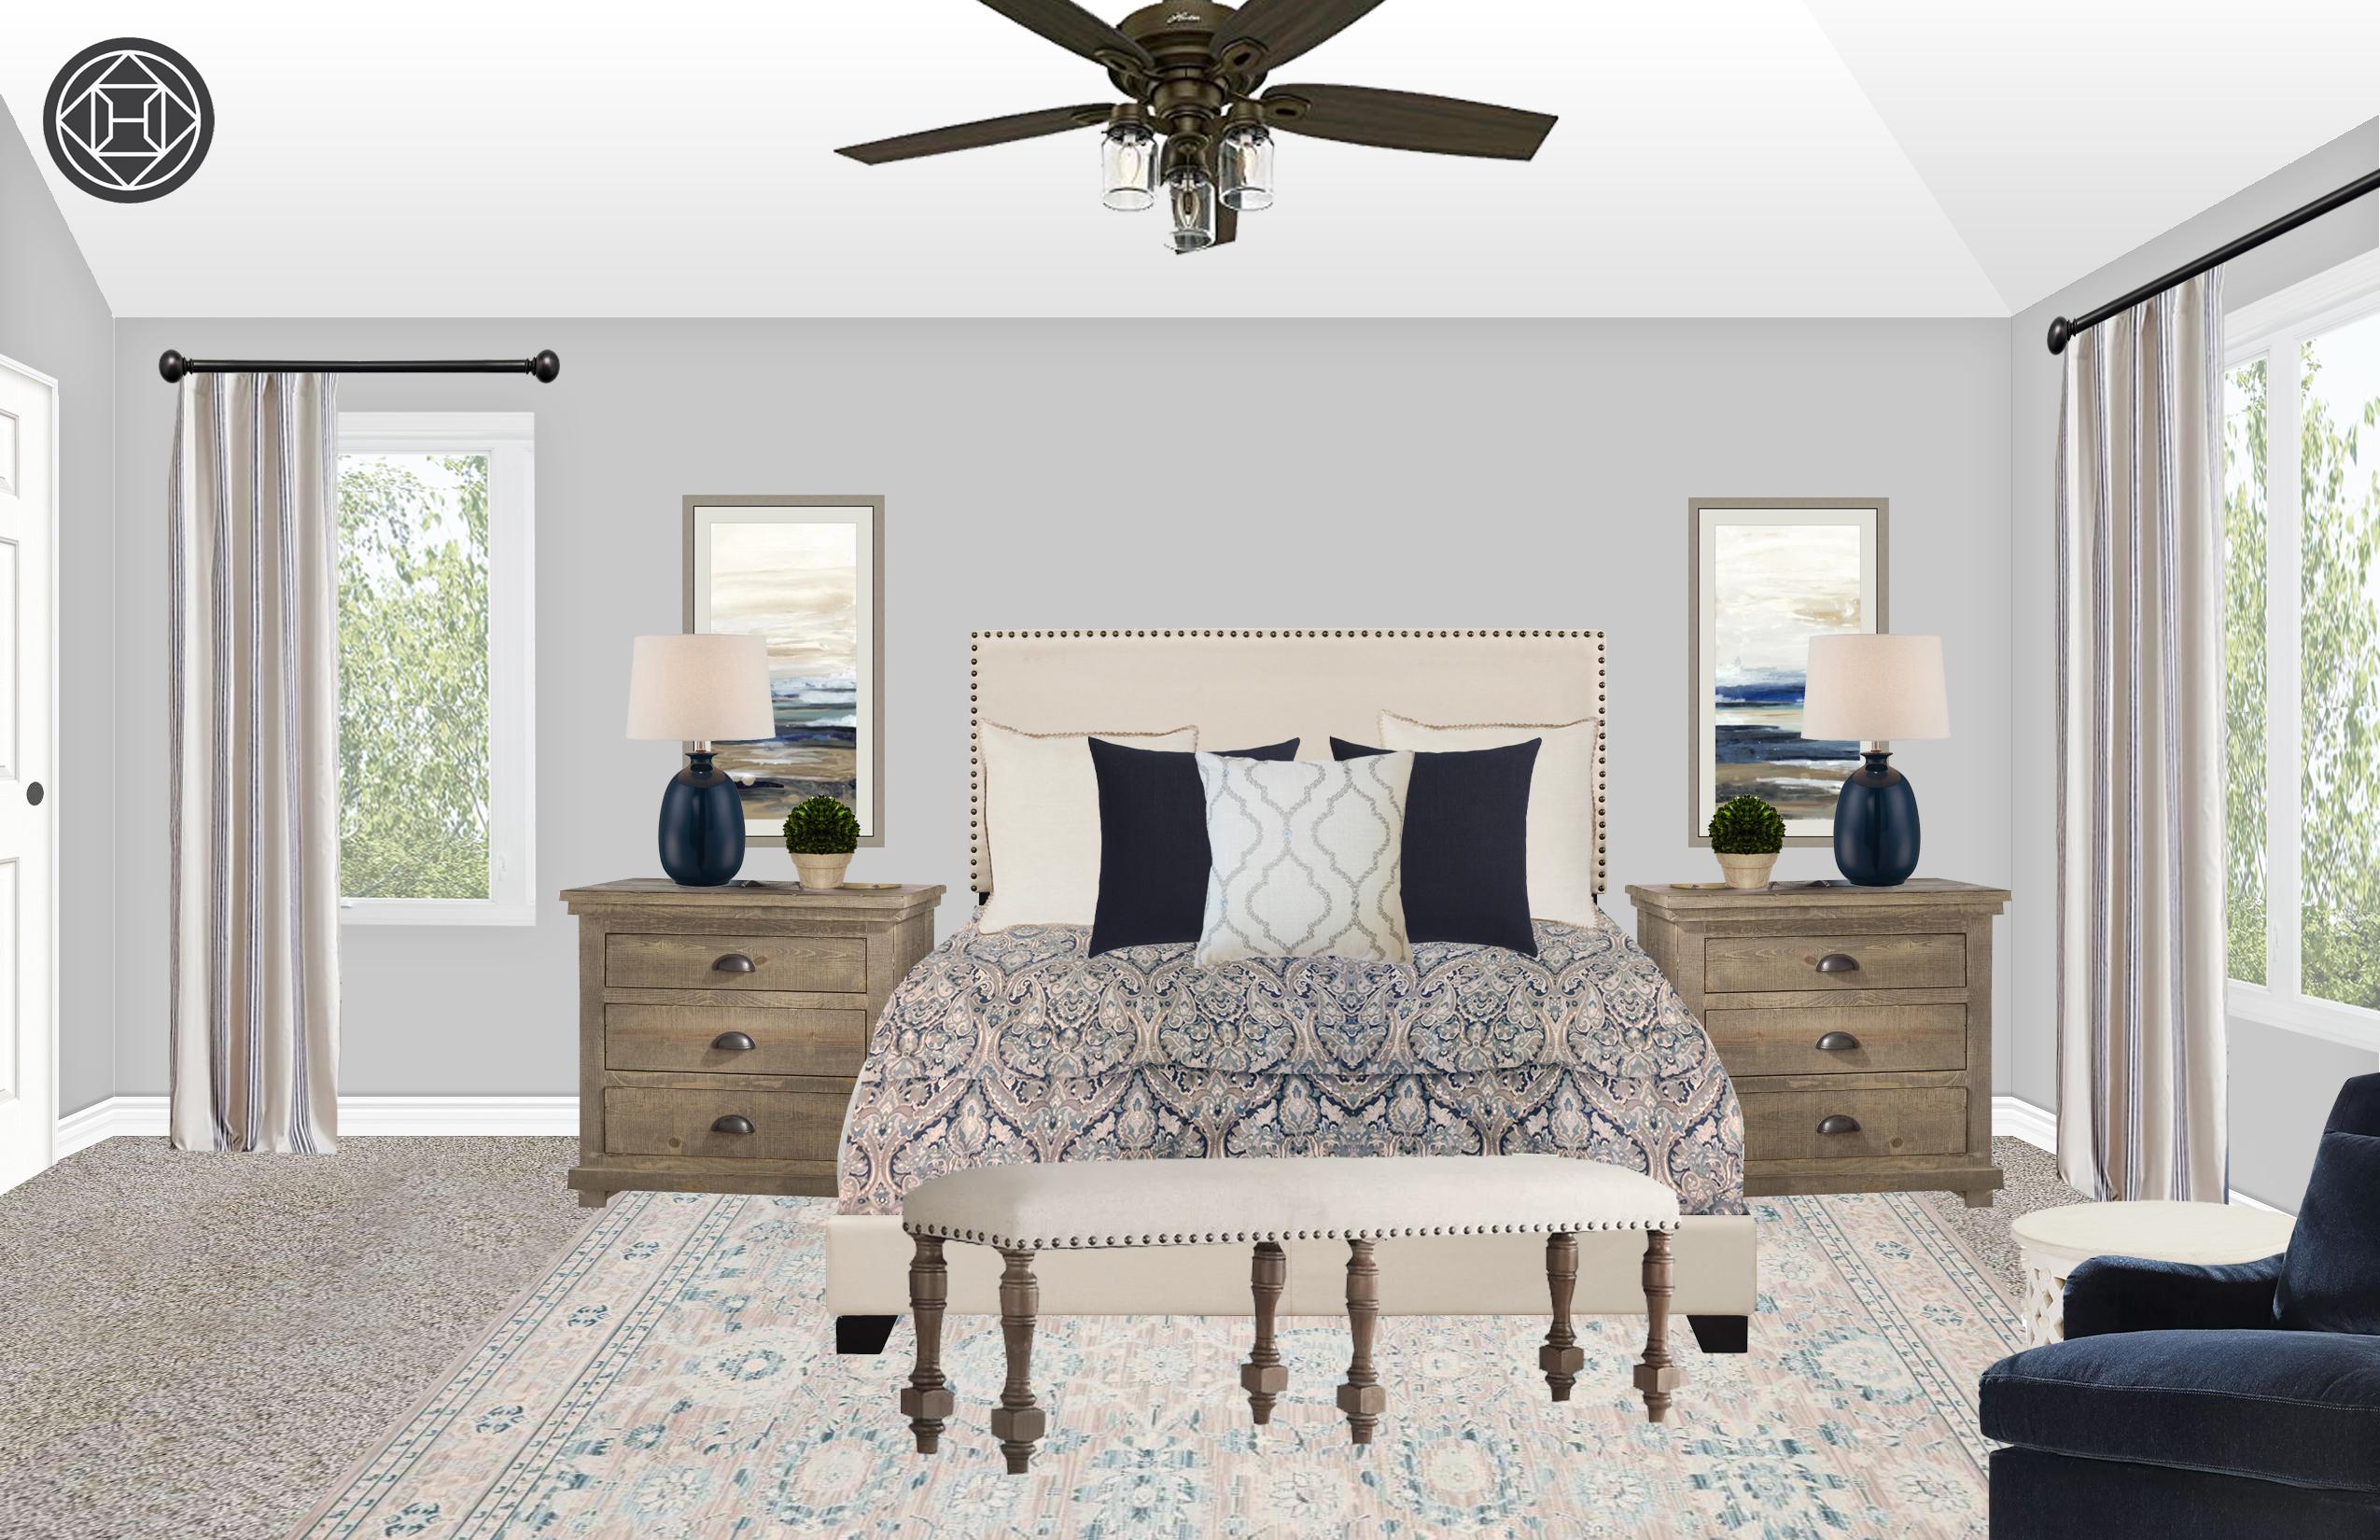 Classic Rustic Bedroom Design By Havenly Interior Designer